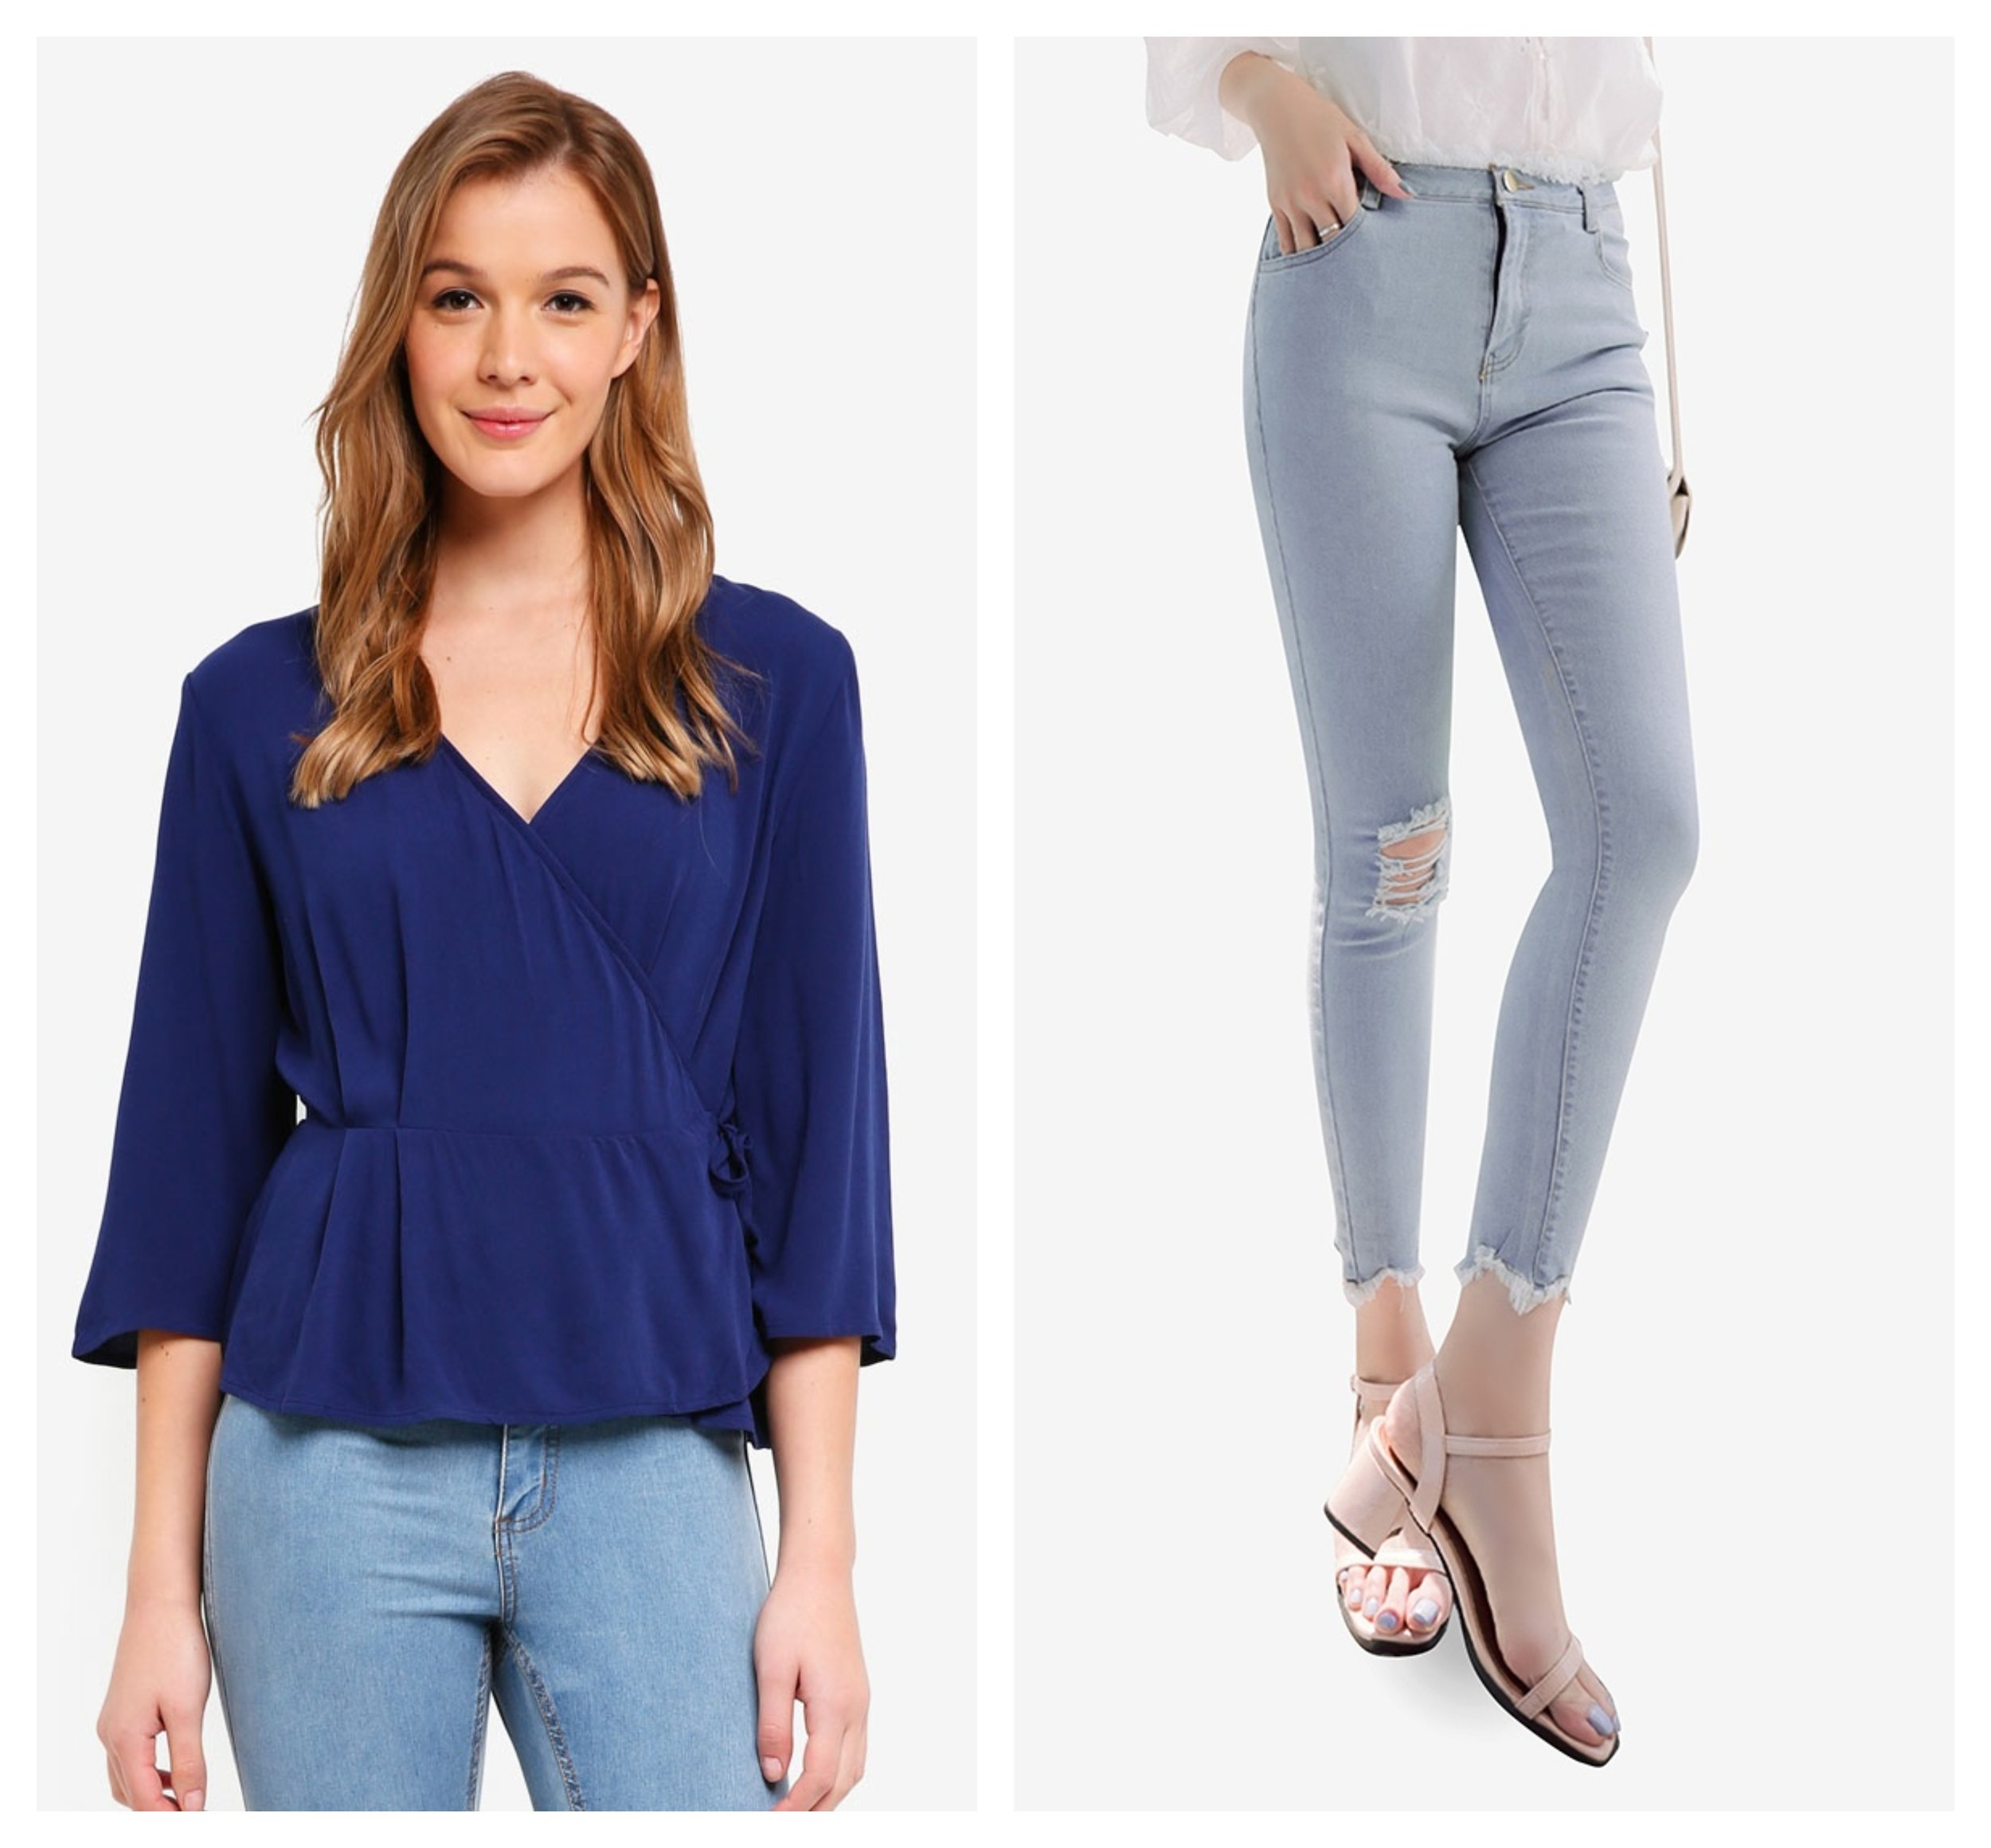 Cotton On Ruth Peplum Wrap Blouse  |  Eyescream Distressed Skinny Jeans